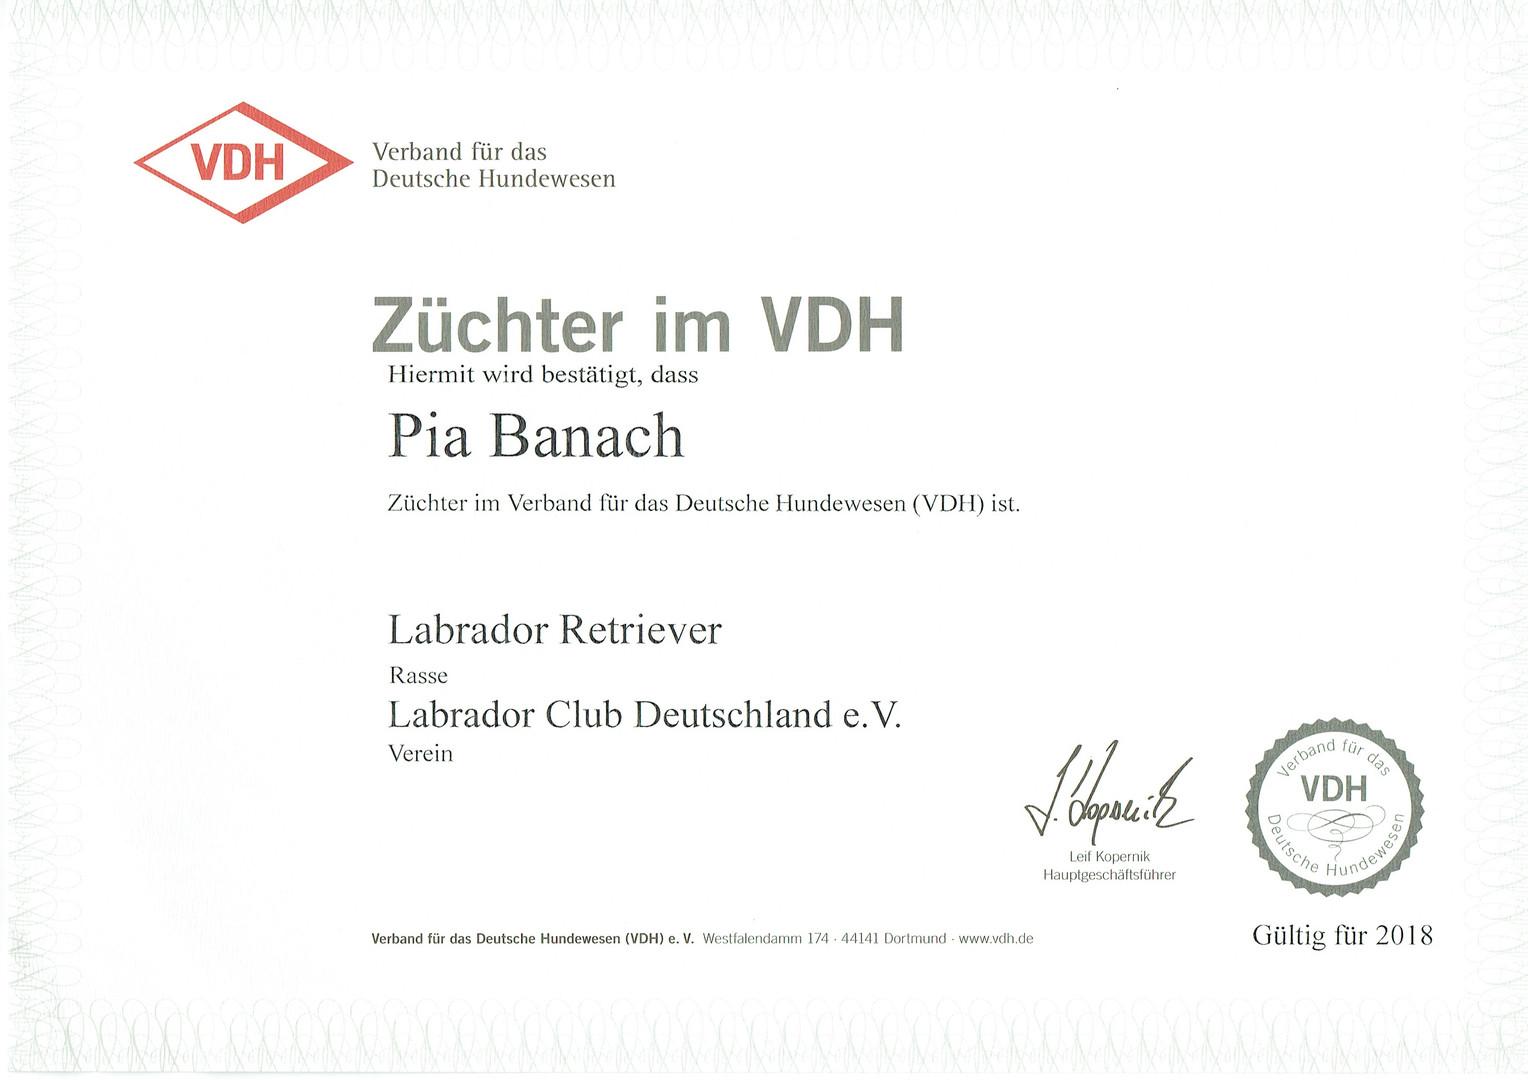 VDH 2018 Urkunde.jpg